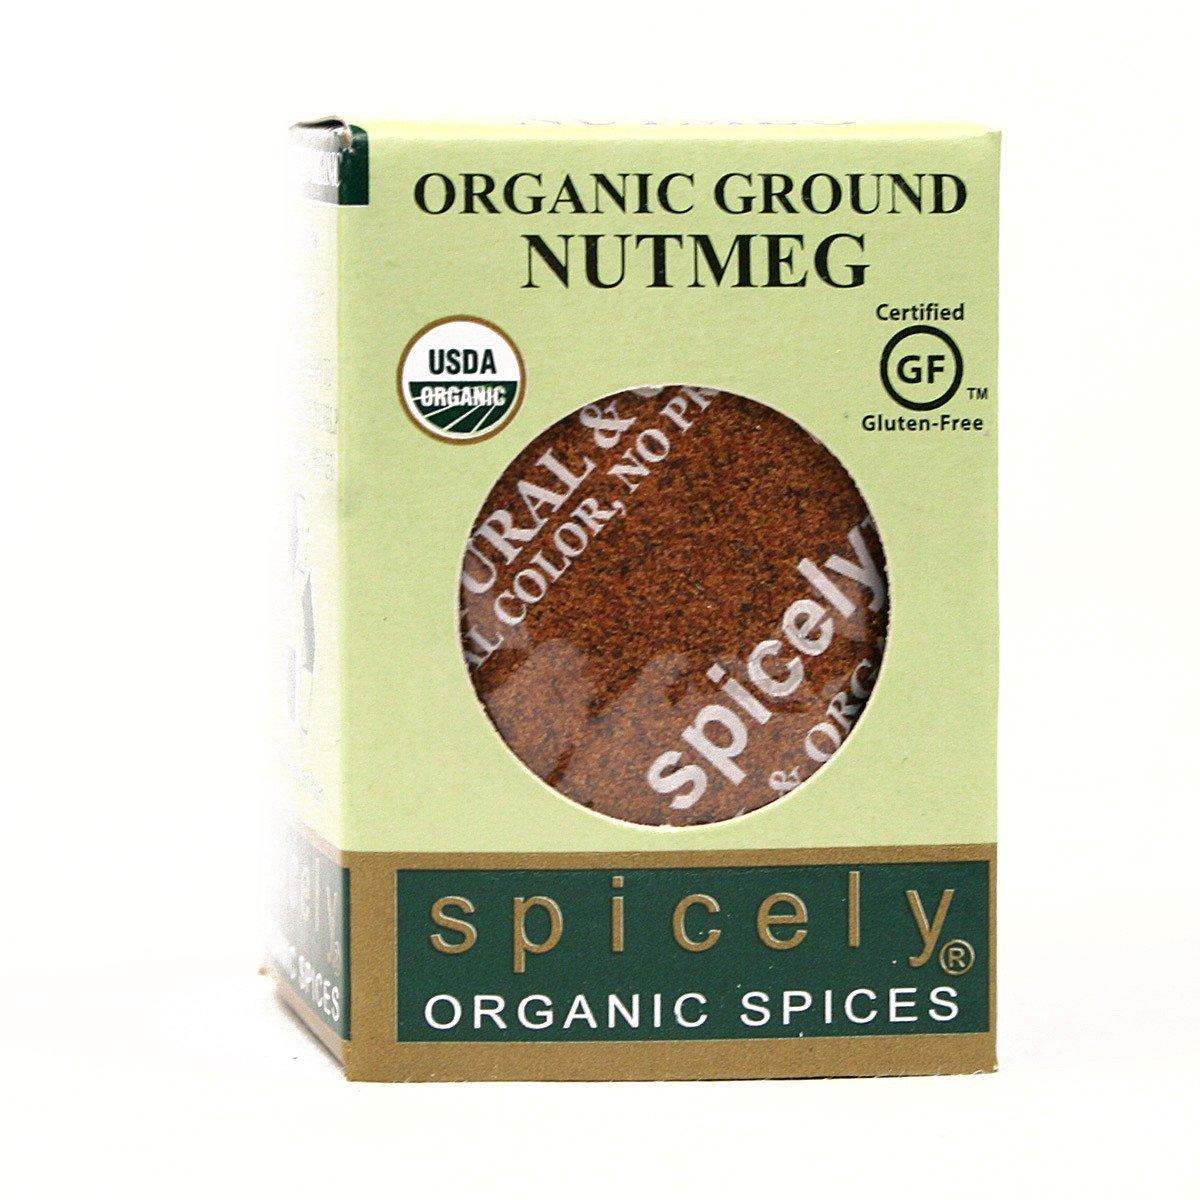 Spicely Organic Nutmeg Powder 0.40 Ounce ecoBox Certified Gluten Free